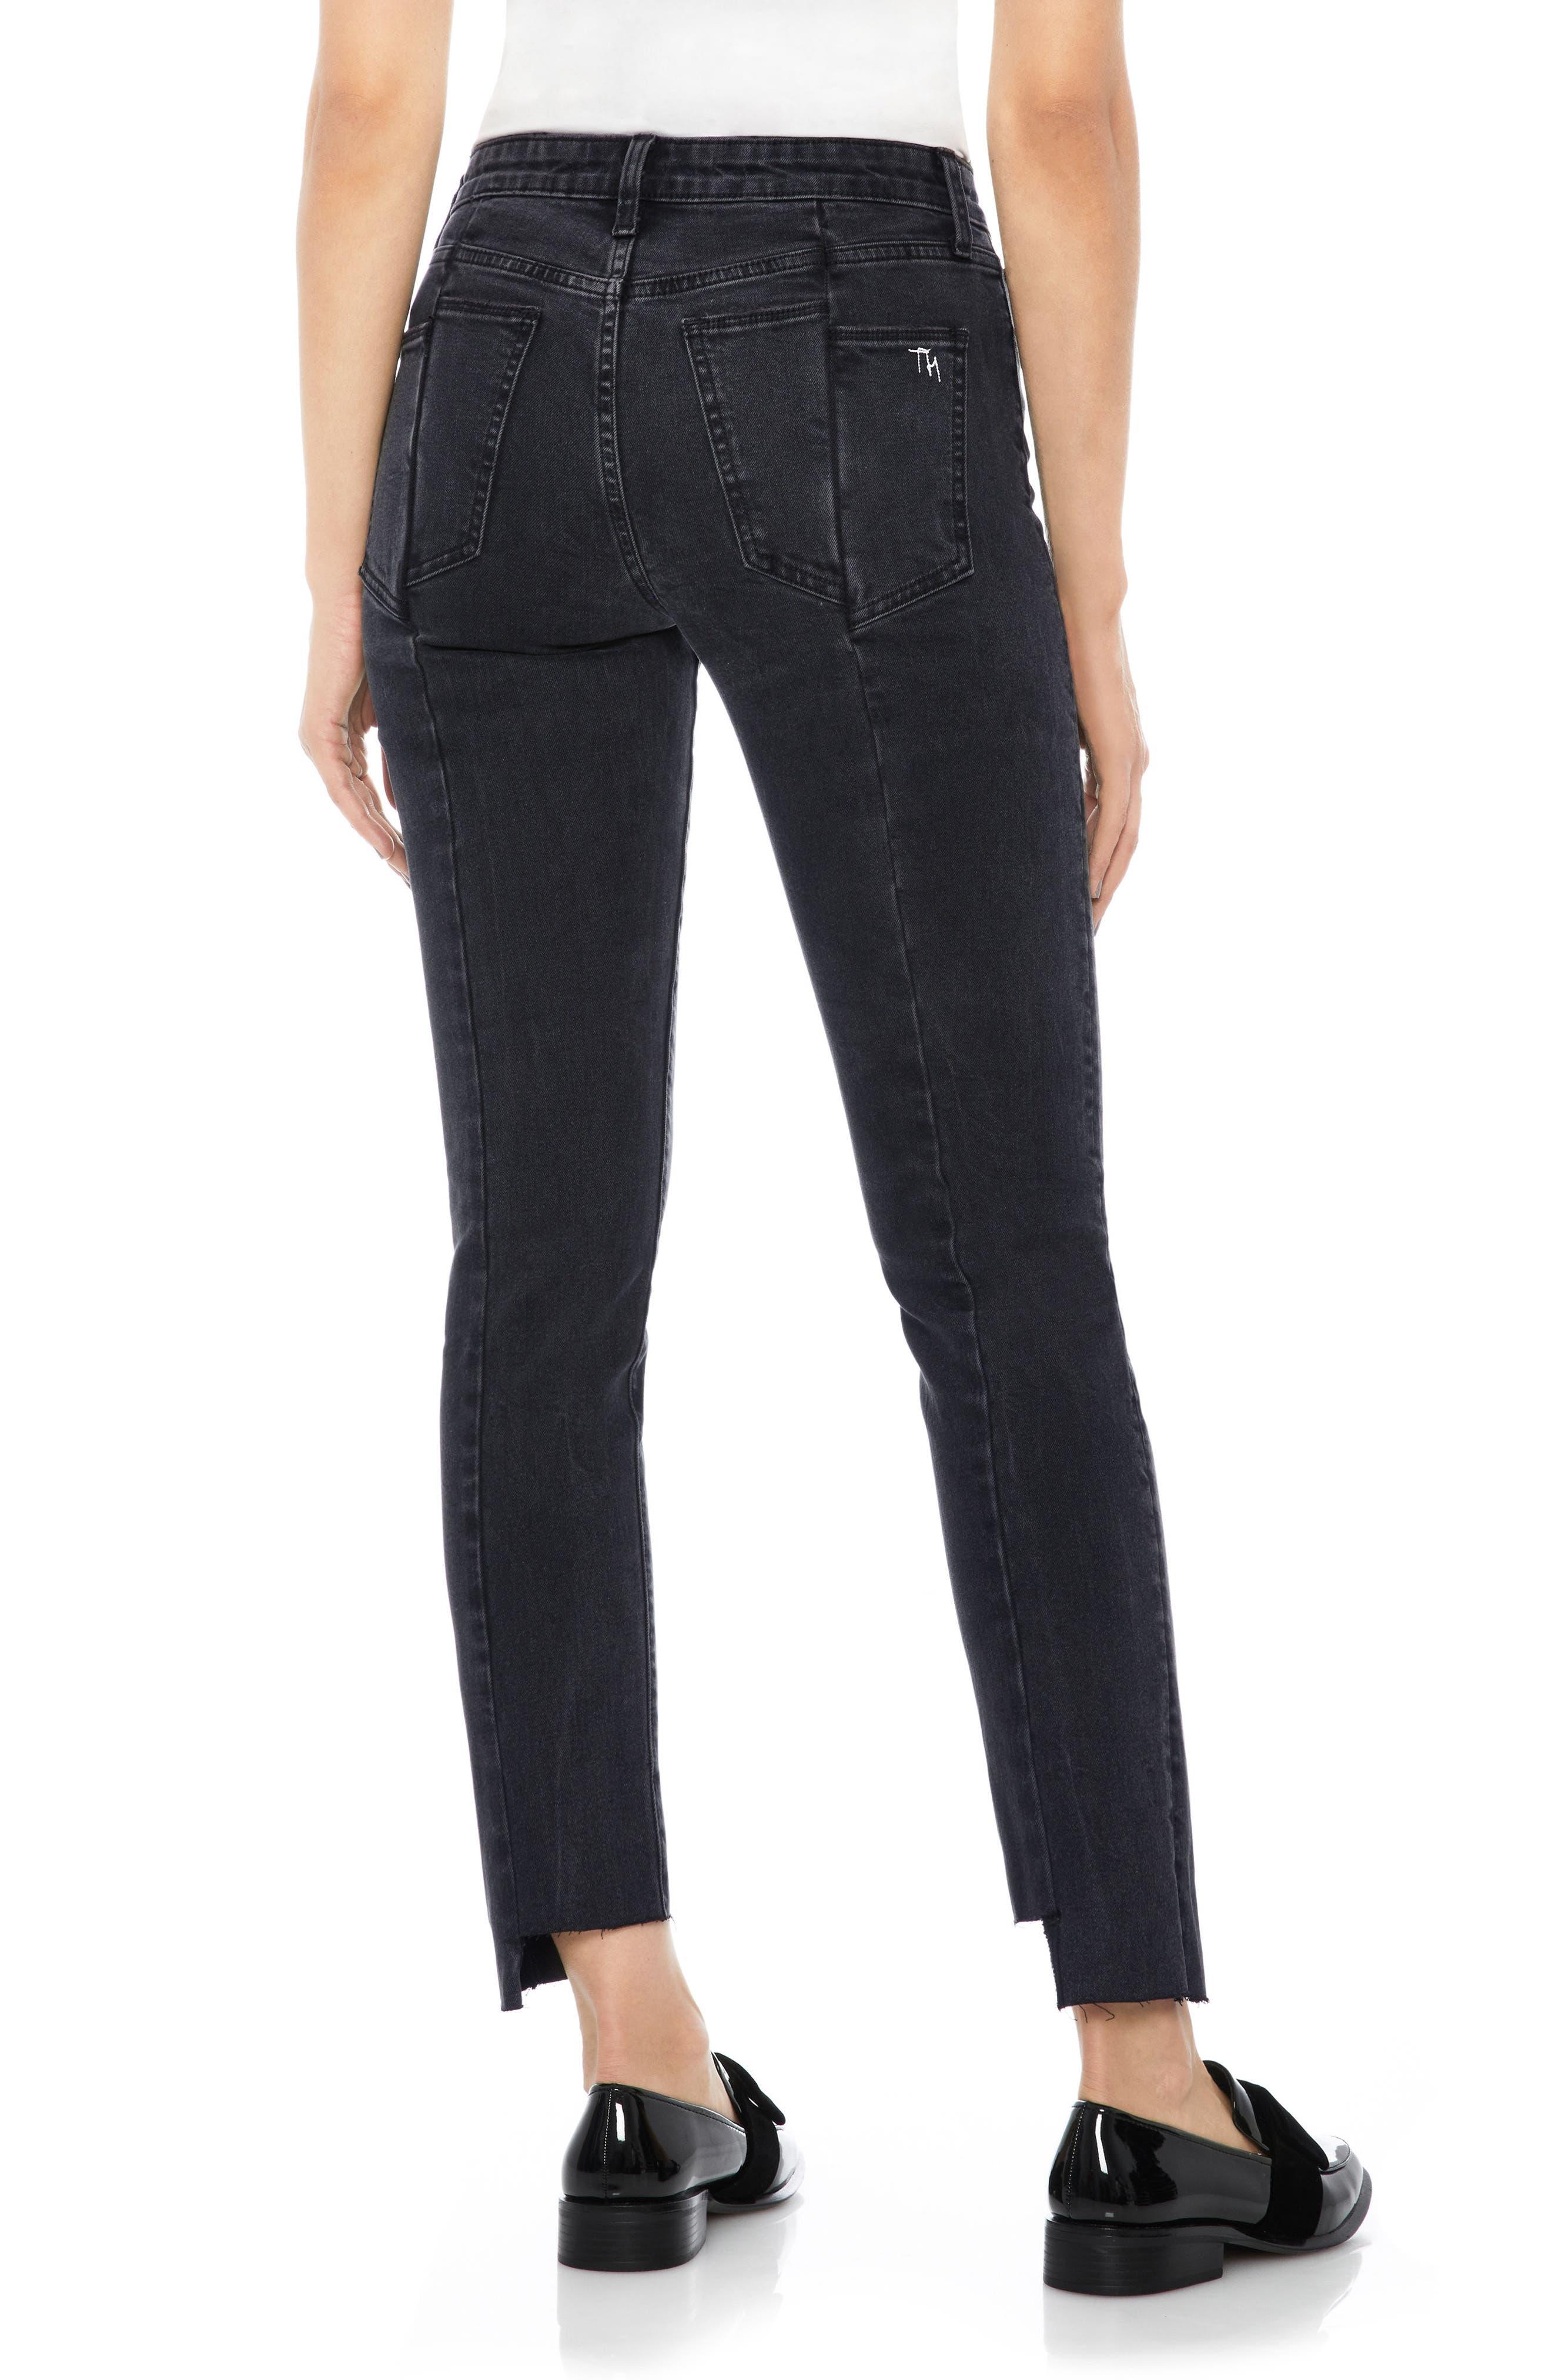 Taylor Hill x Joe's Kass Raw Step Hem Ankle Skinny Jeans,                             Alternate thumbnail 2, color,                             011